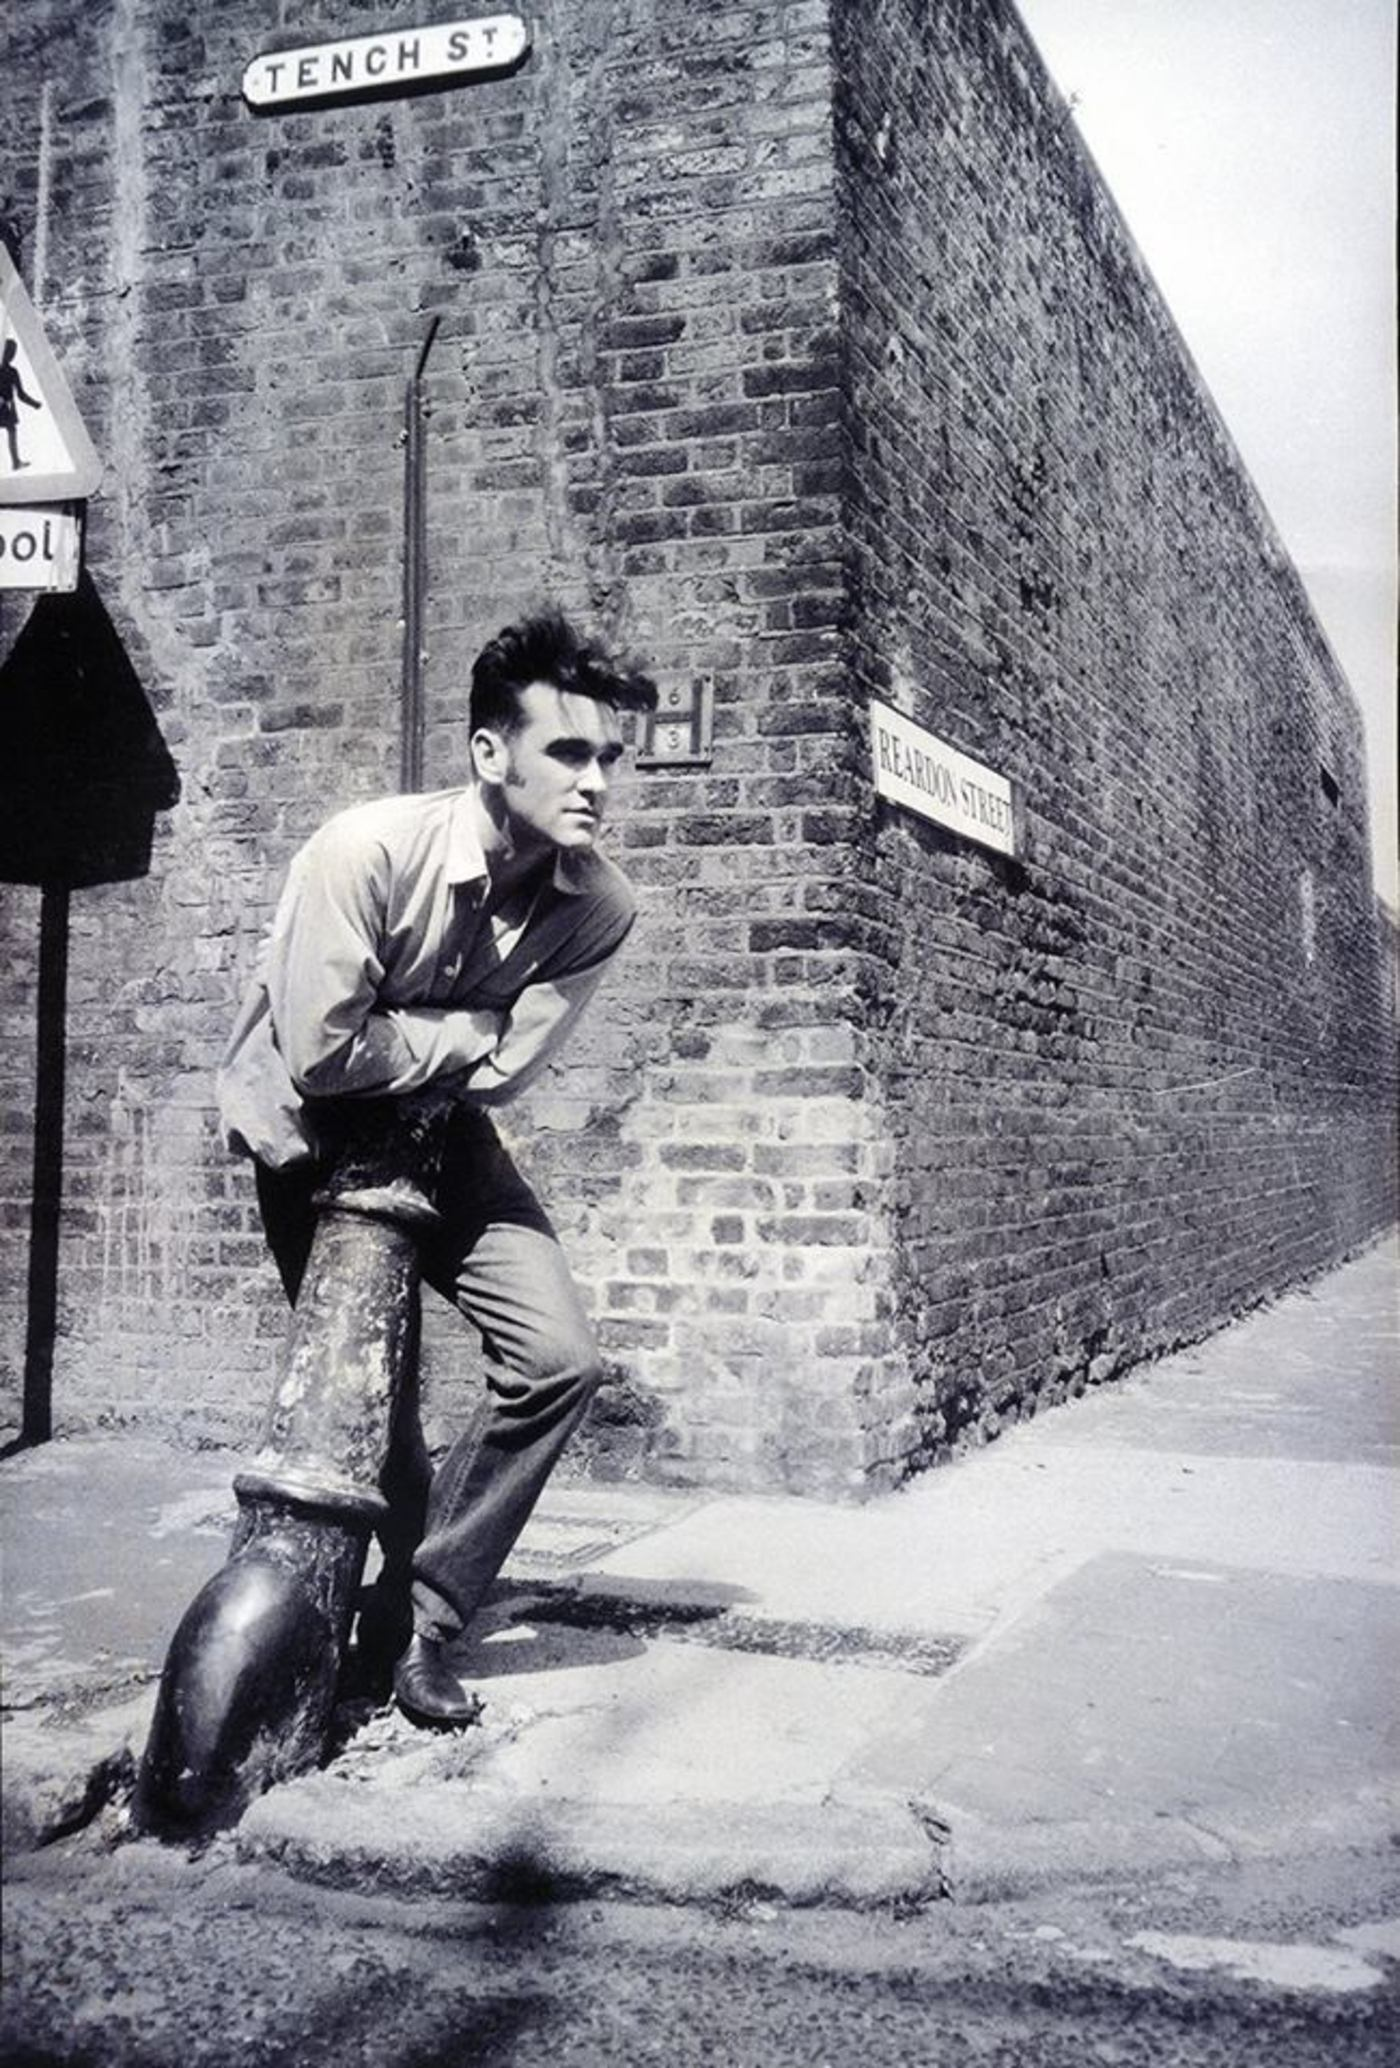 MorrisseyTeller1990_1.jpeg